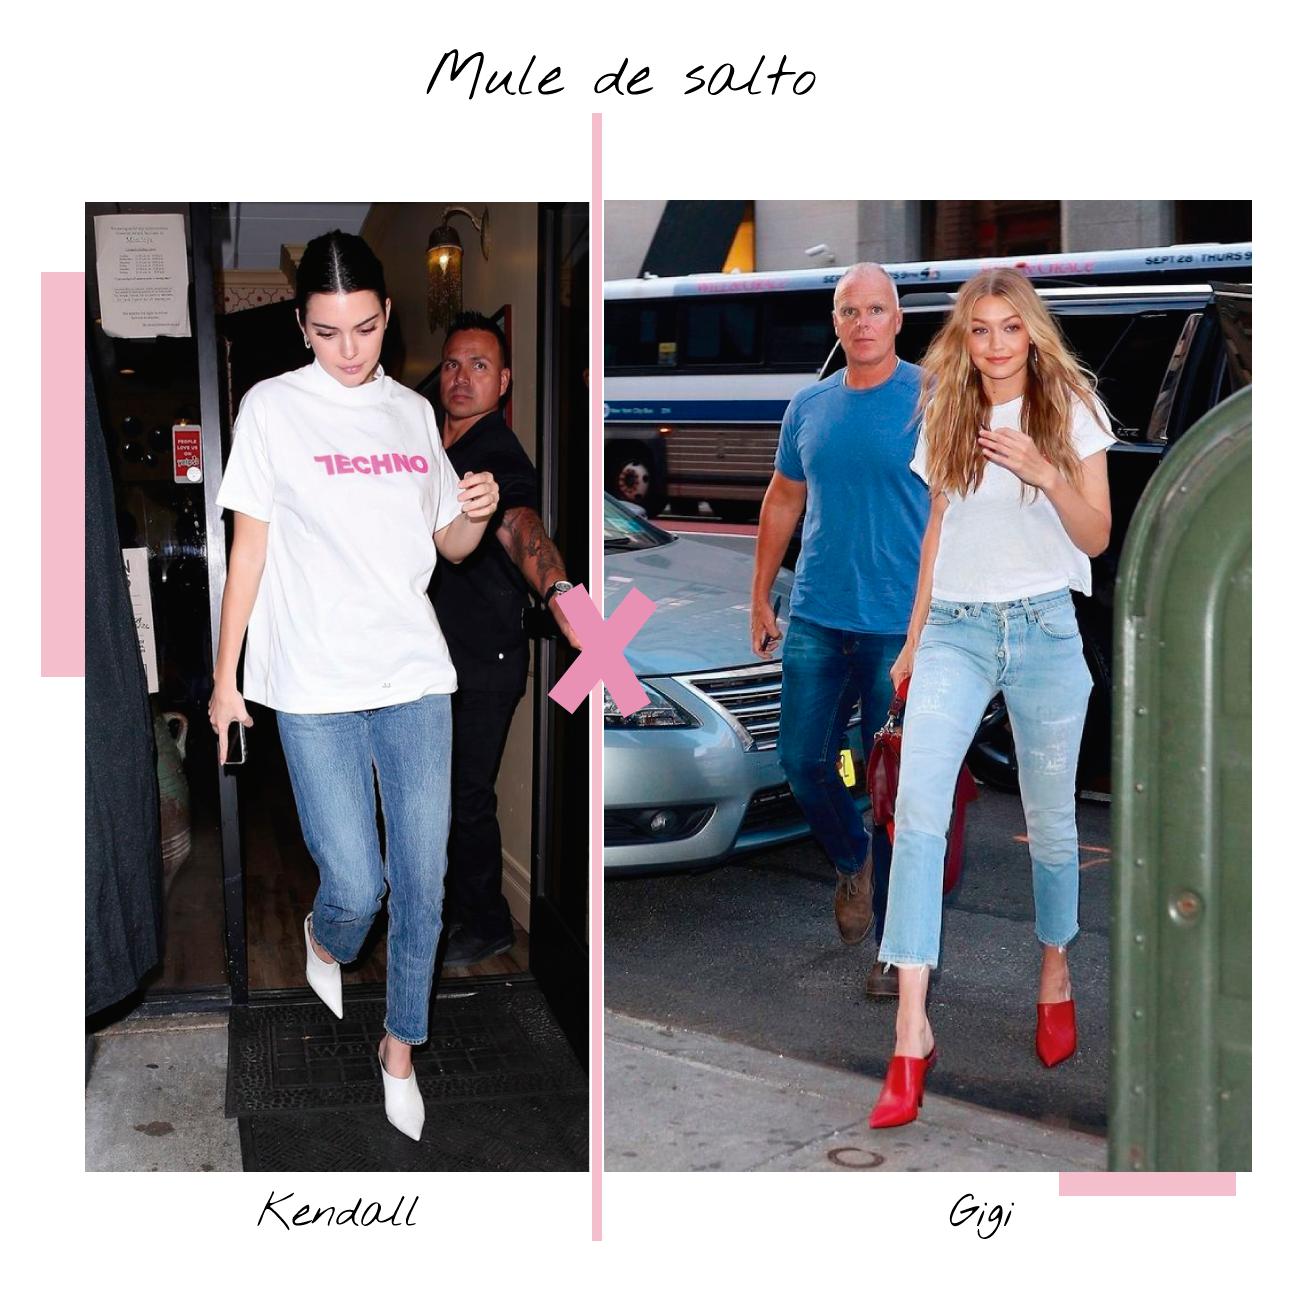 Mule Kendall E gigi